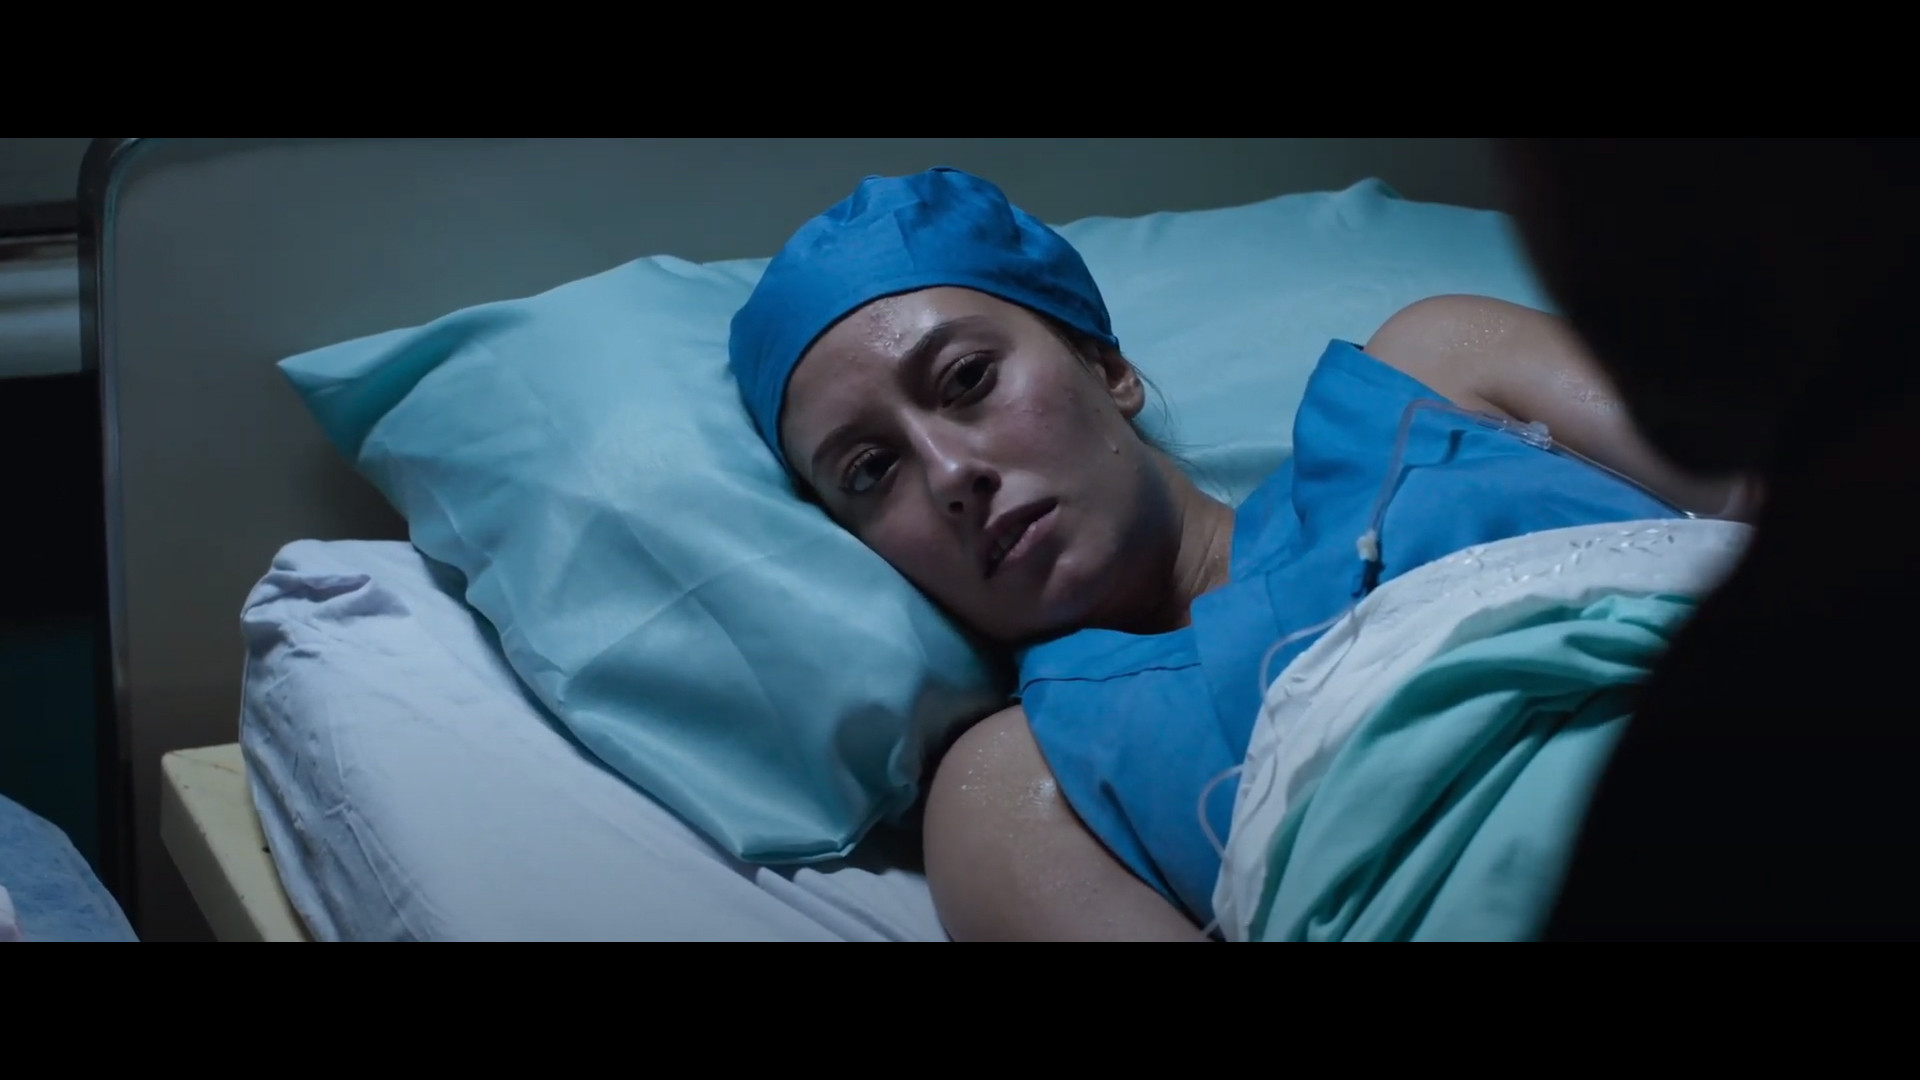 Águas Selvagens - Feature Film